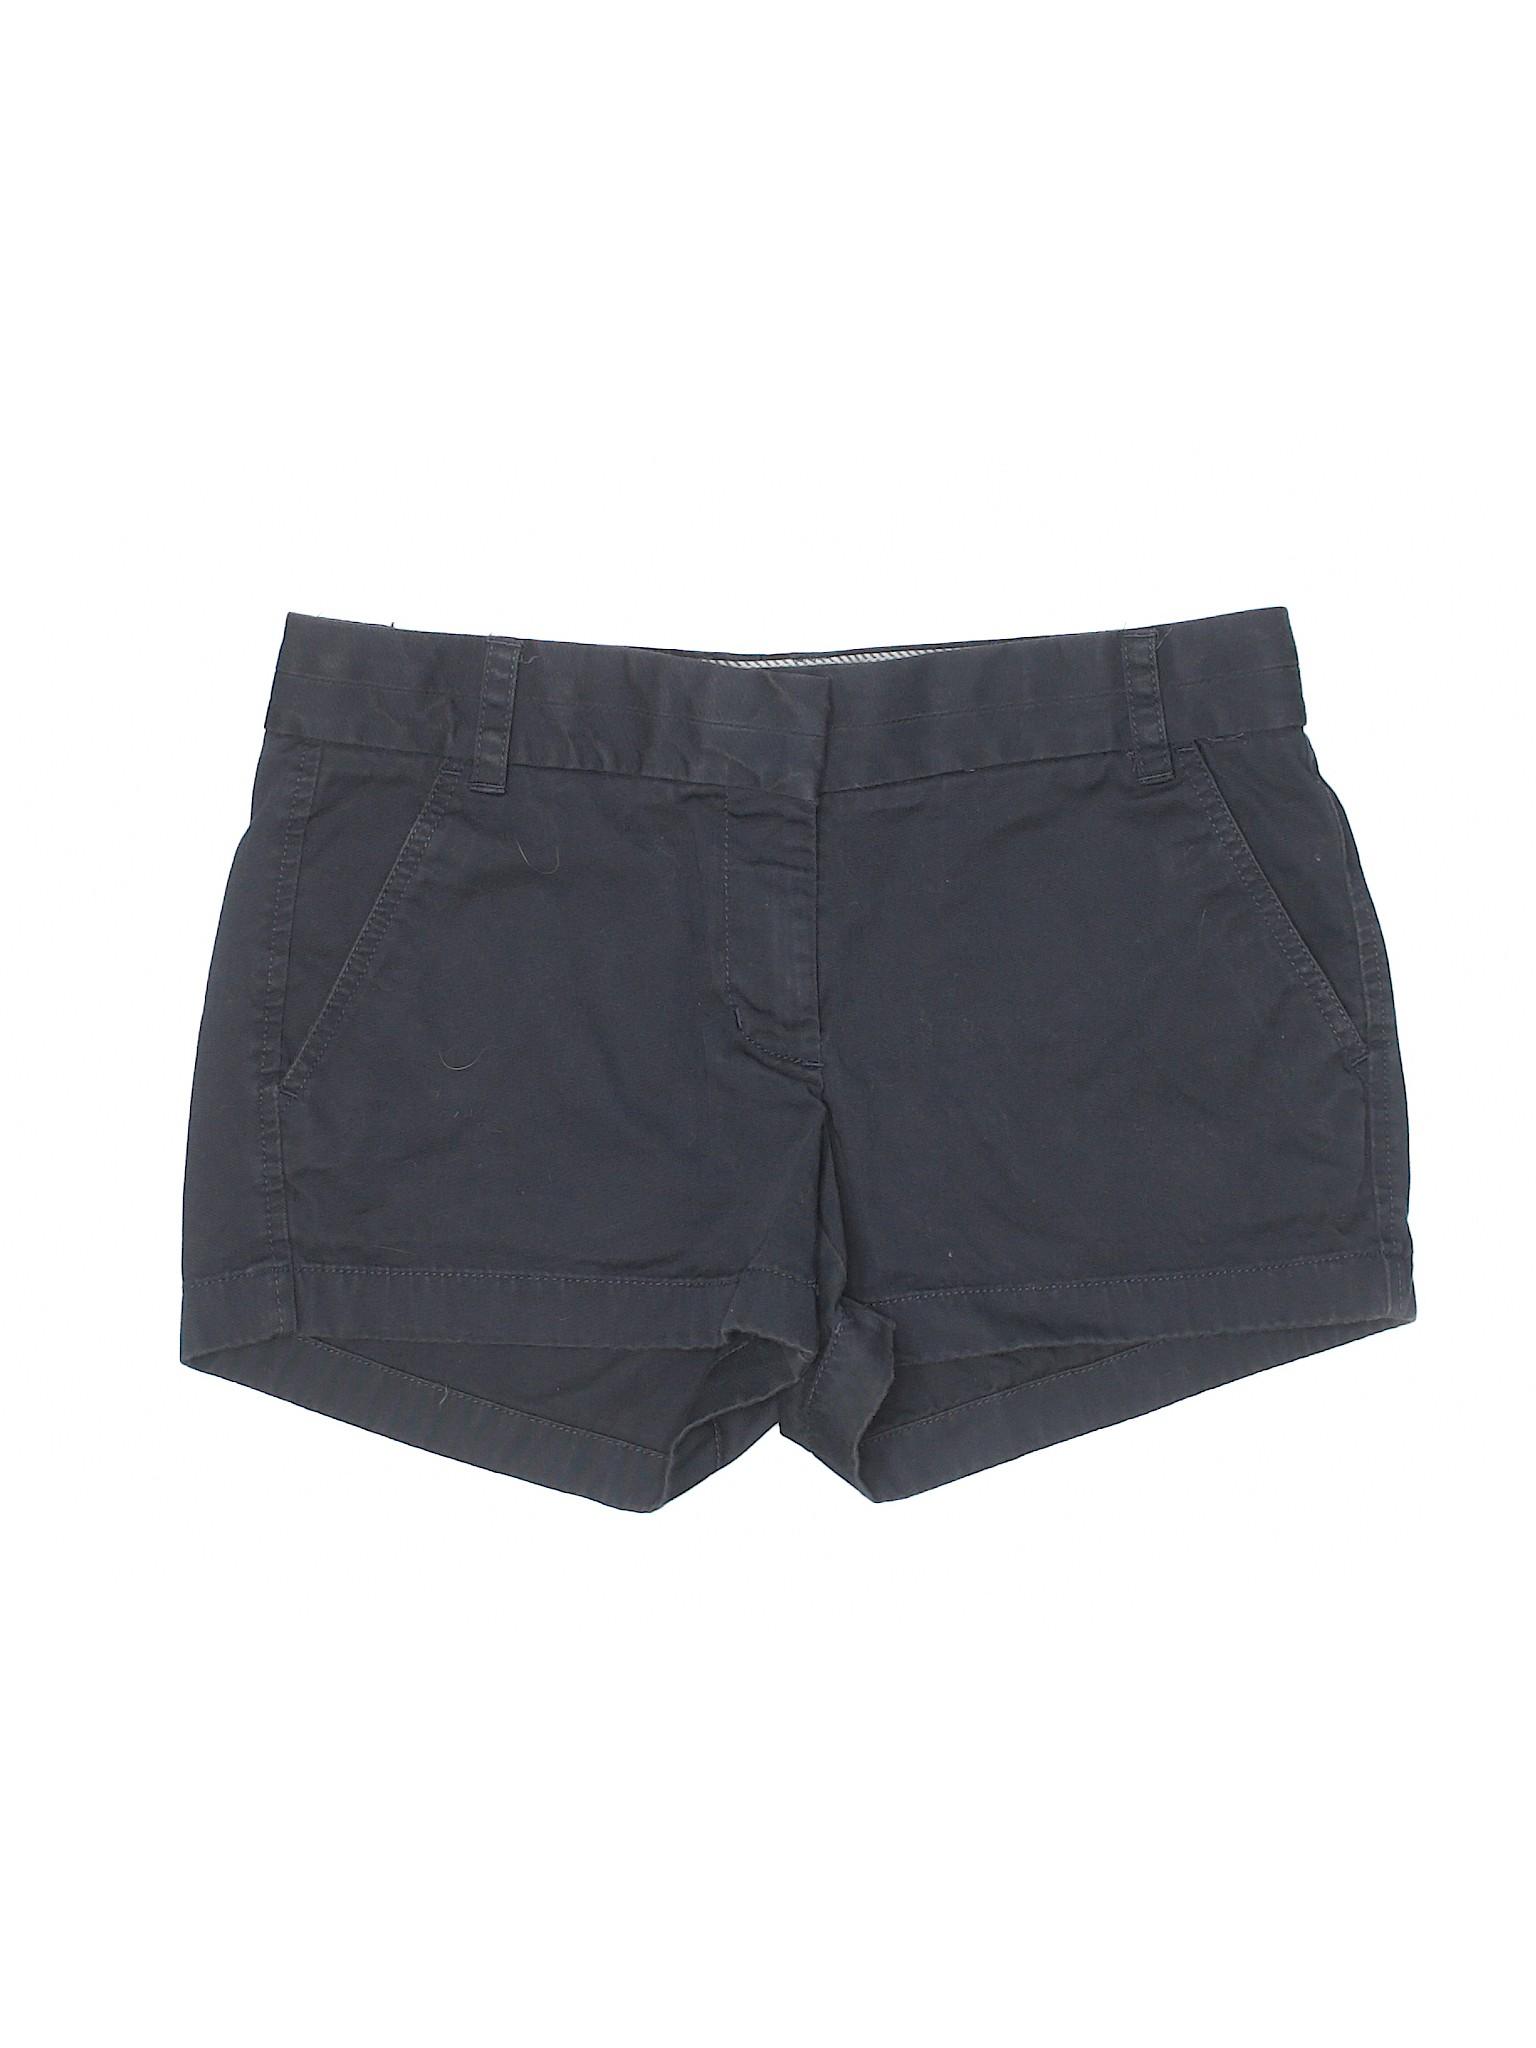 Shorts Crew Boutique Boutique J Crew Shorts Khaki J Khaki Yw1AdBxY